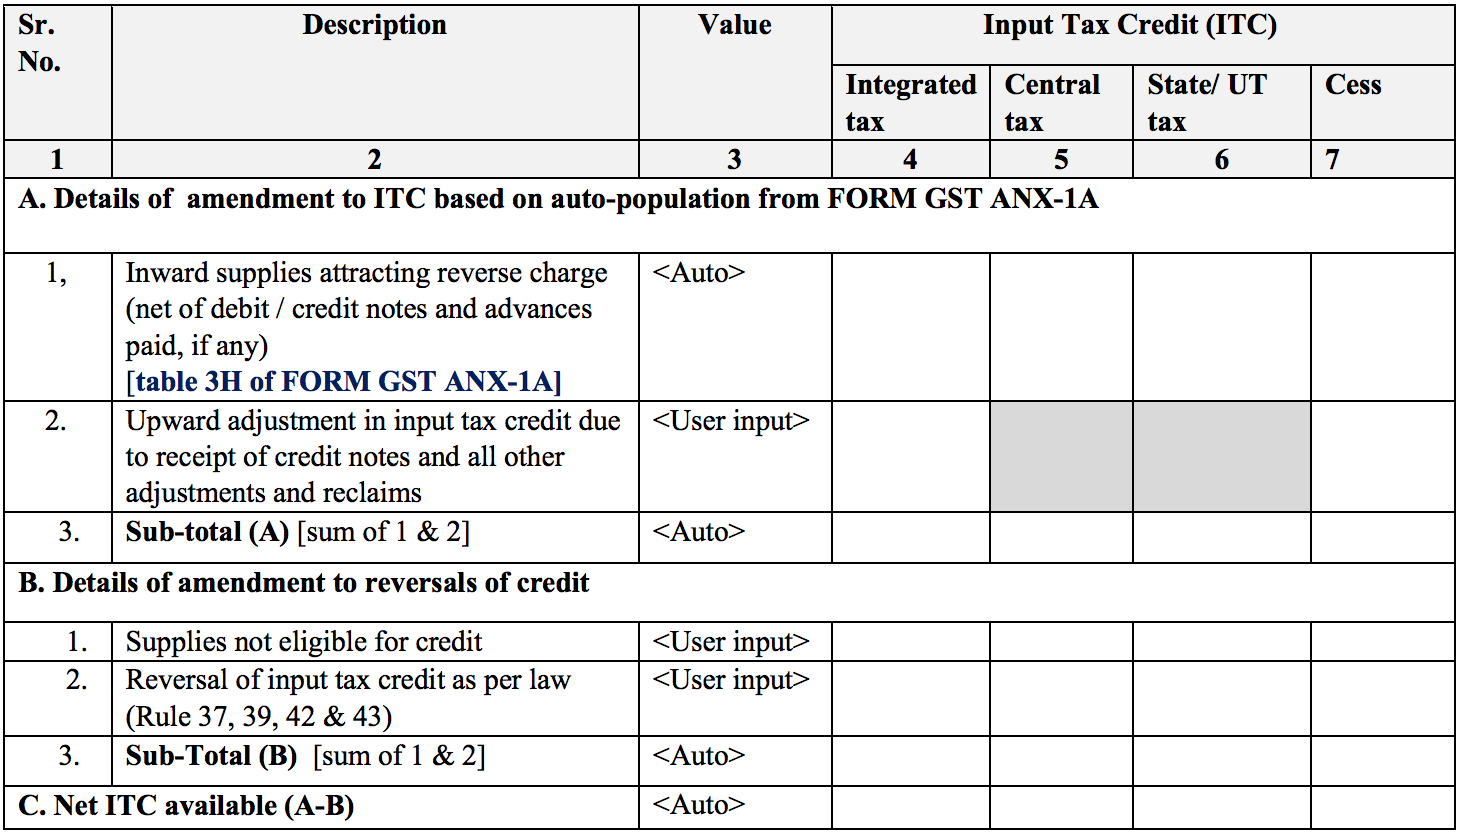 Summary of inward supplies to claim ITC  in Sahaj return form GST RET-2A